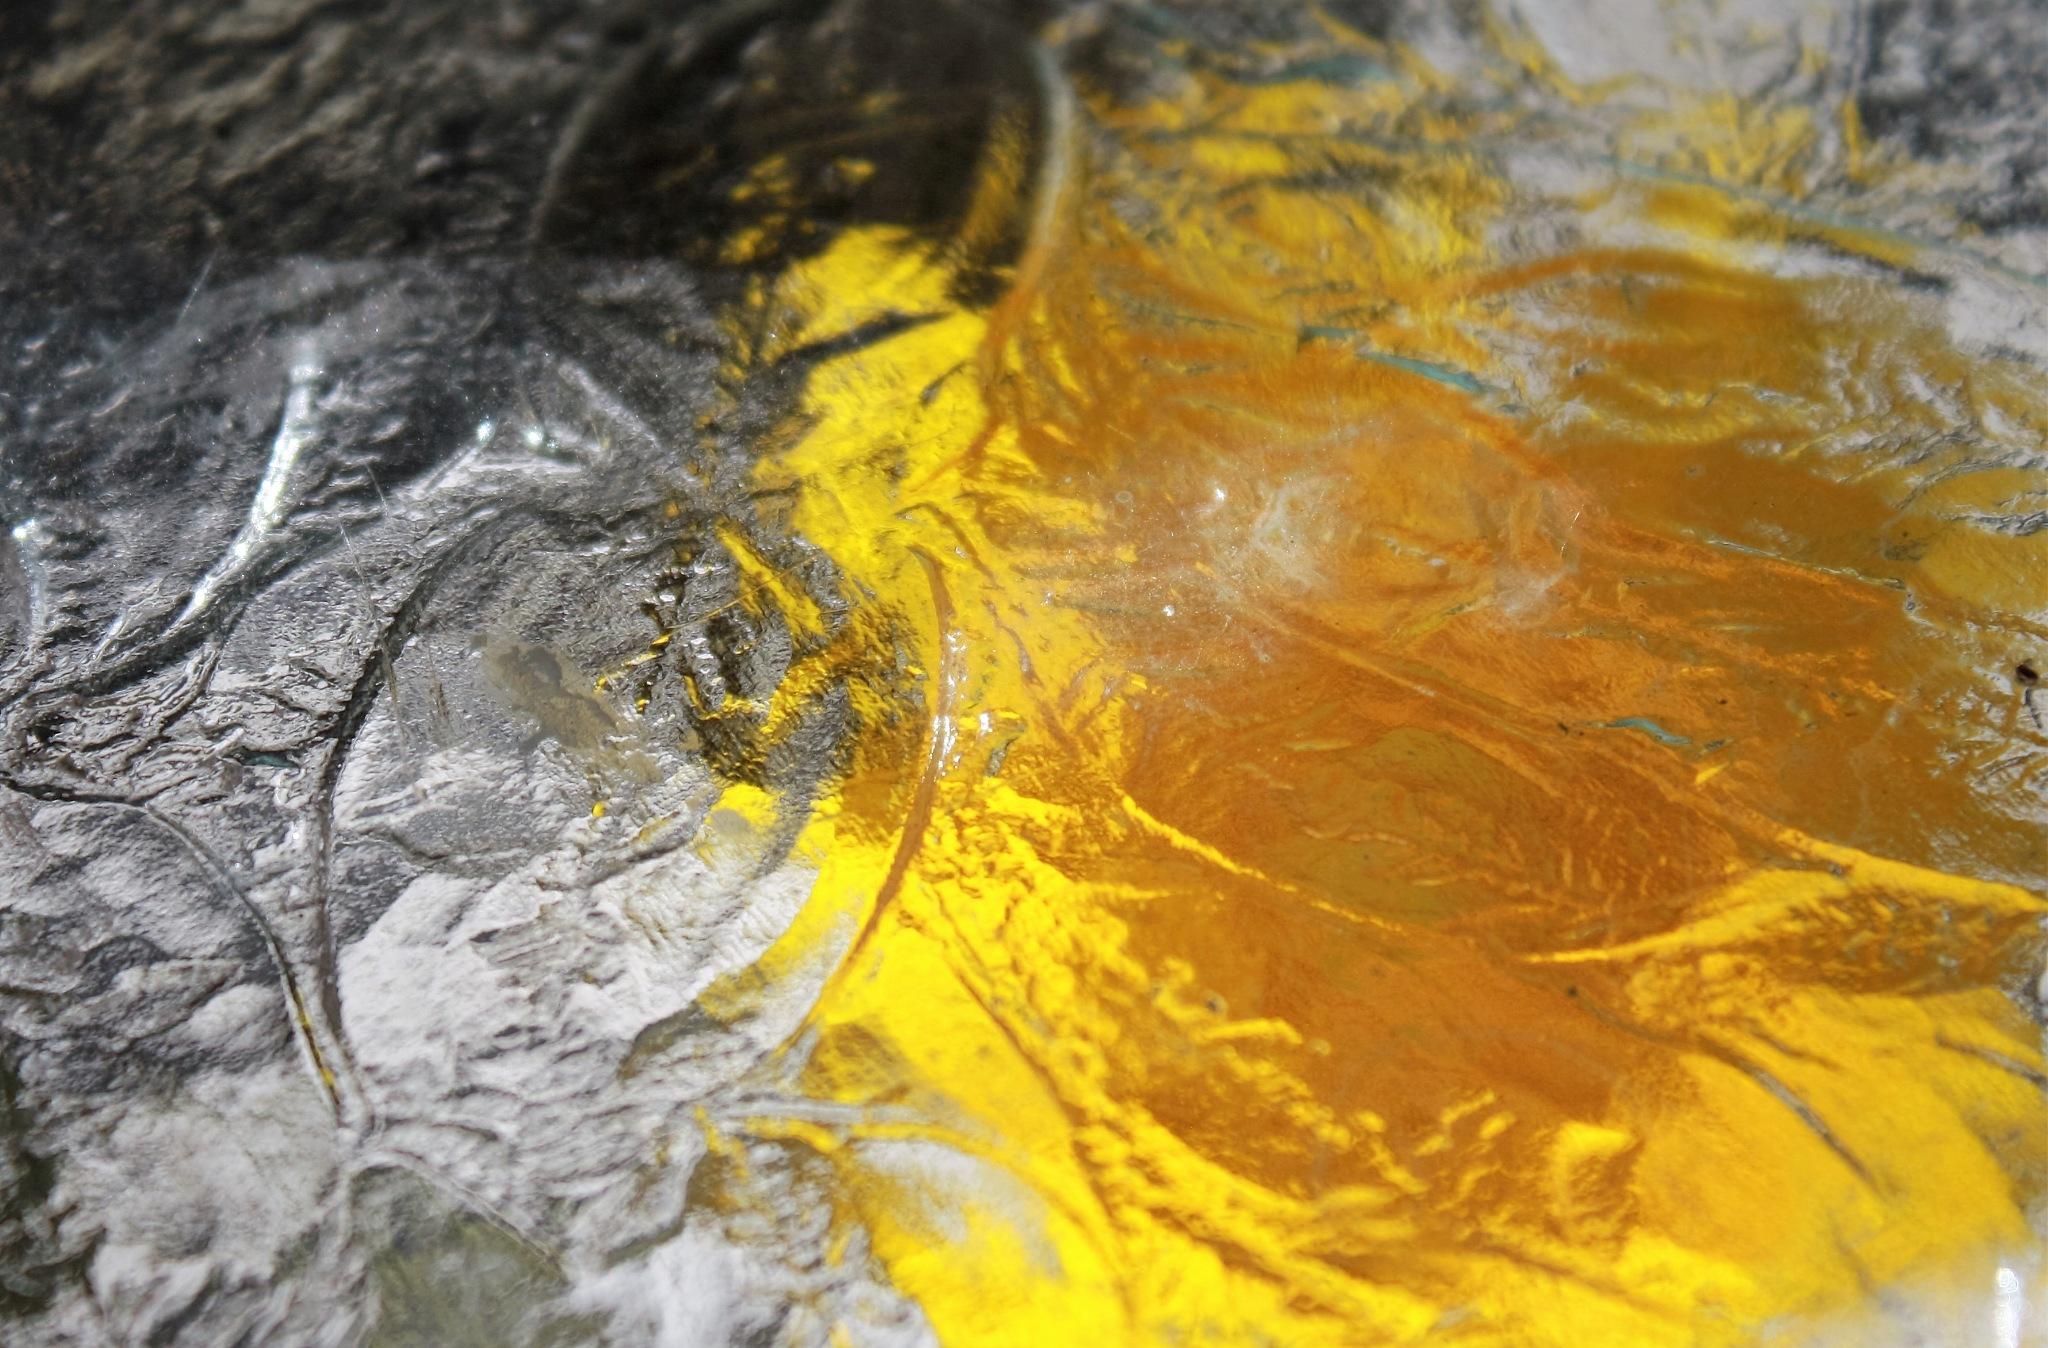 Yellow under glass by joann.kunkle